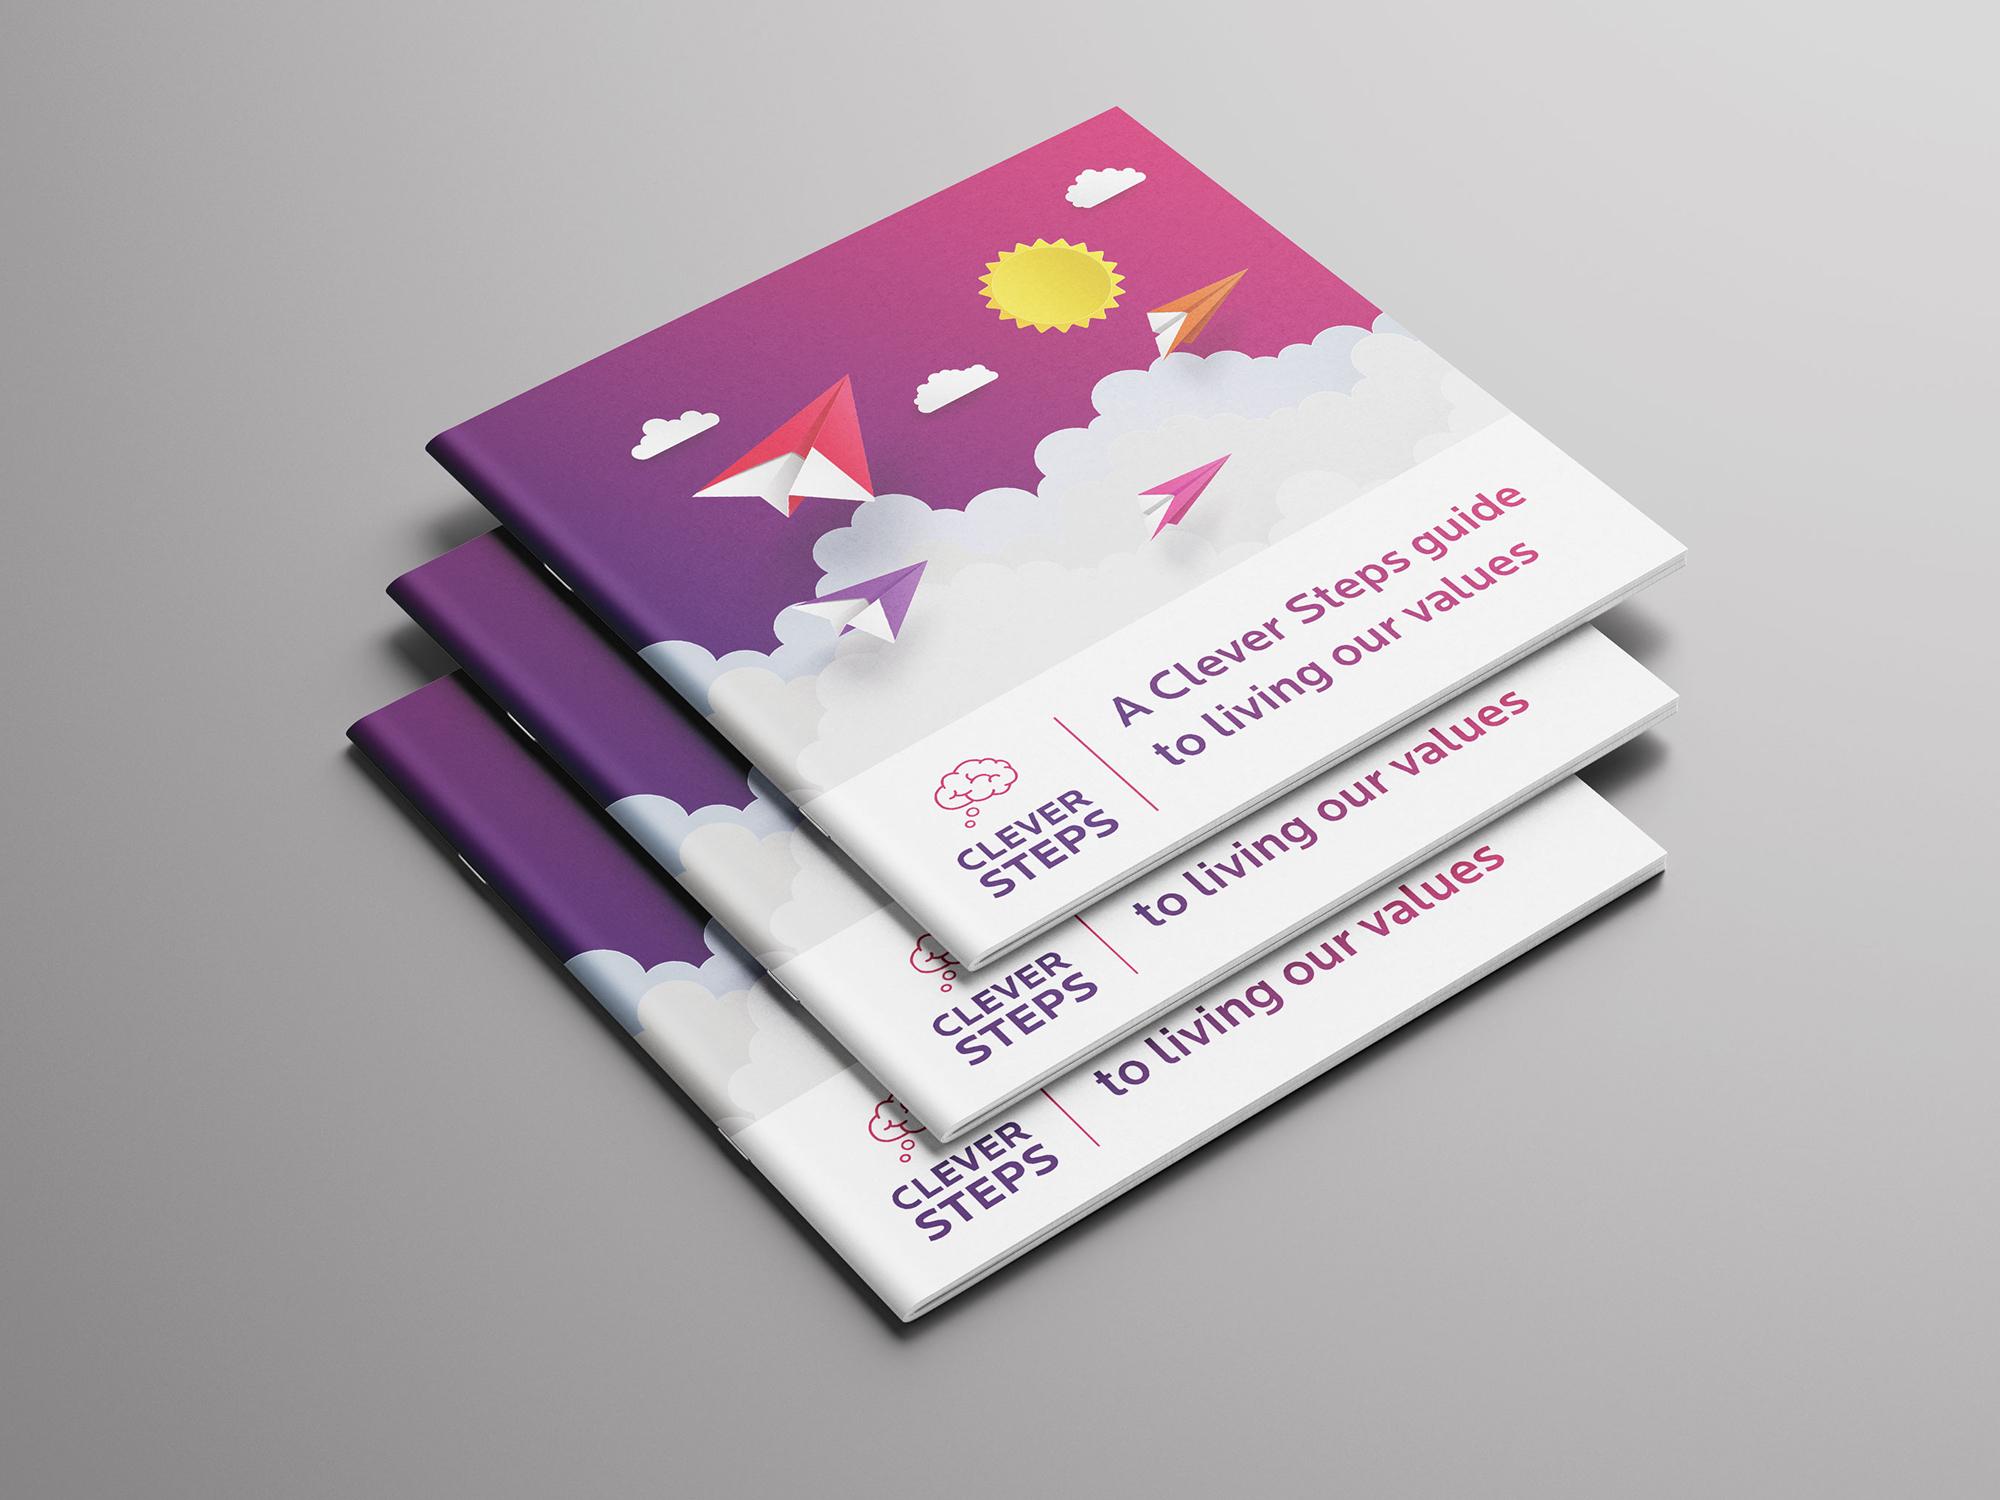 Clever_Steps_Free_Square_Brochure_Mockup_04_2000.jpg